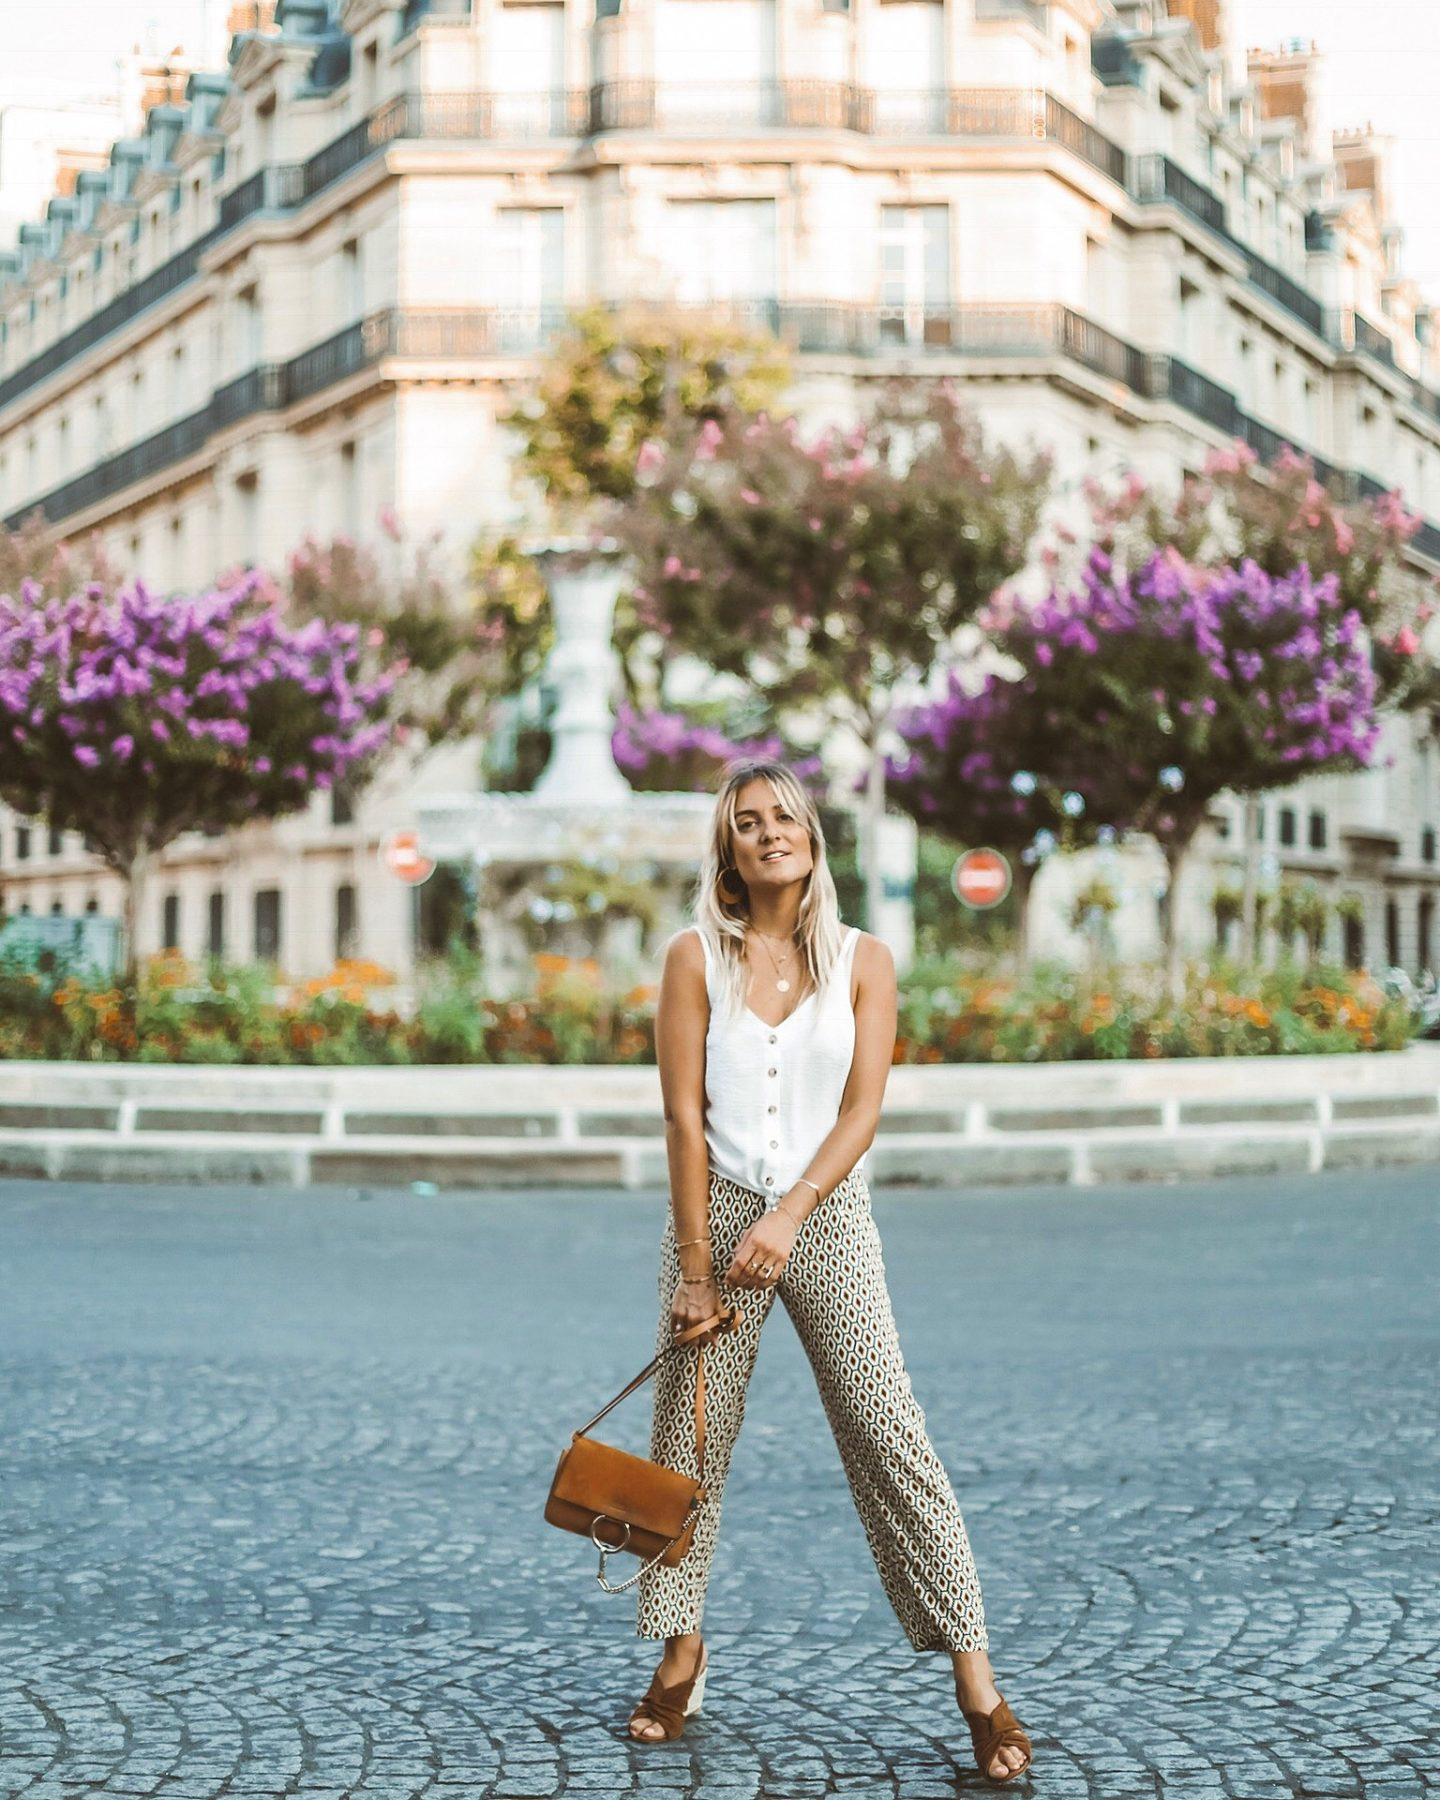 Top blanc Etam - Blondie Baby blog mode Paris et voyages